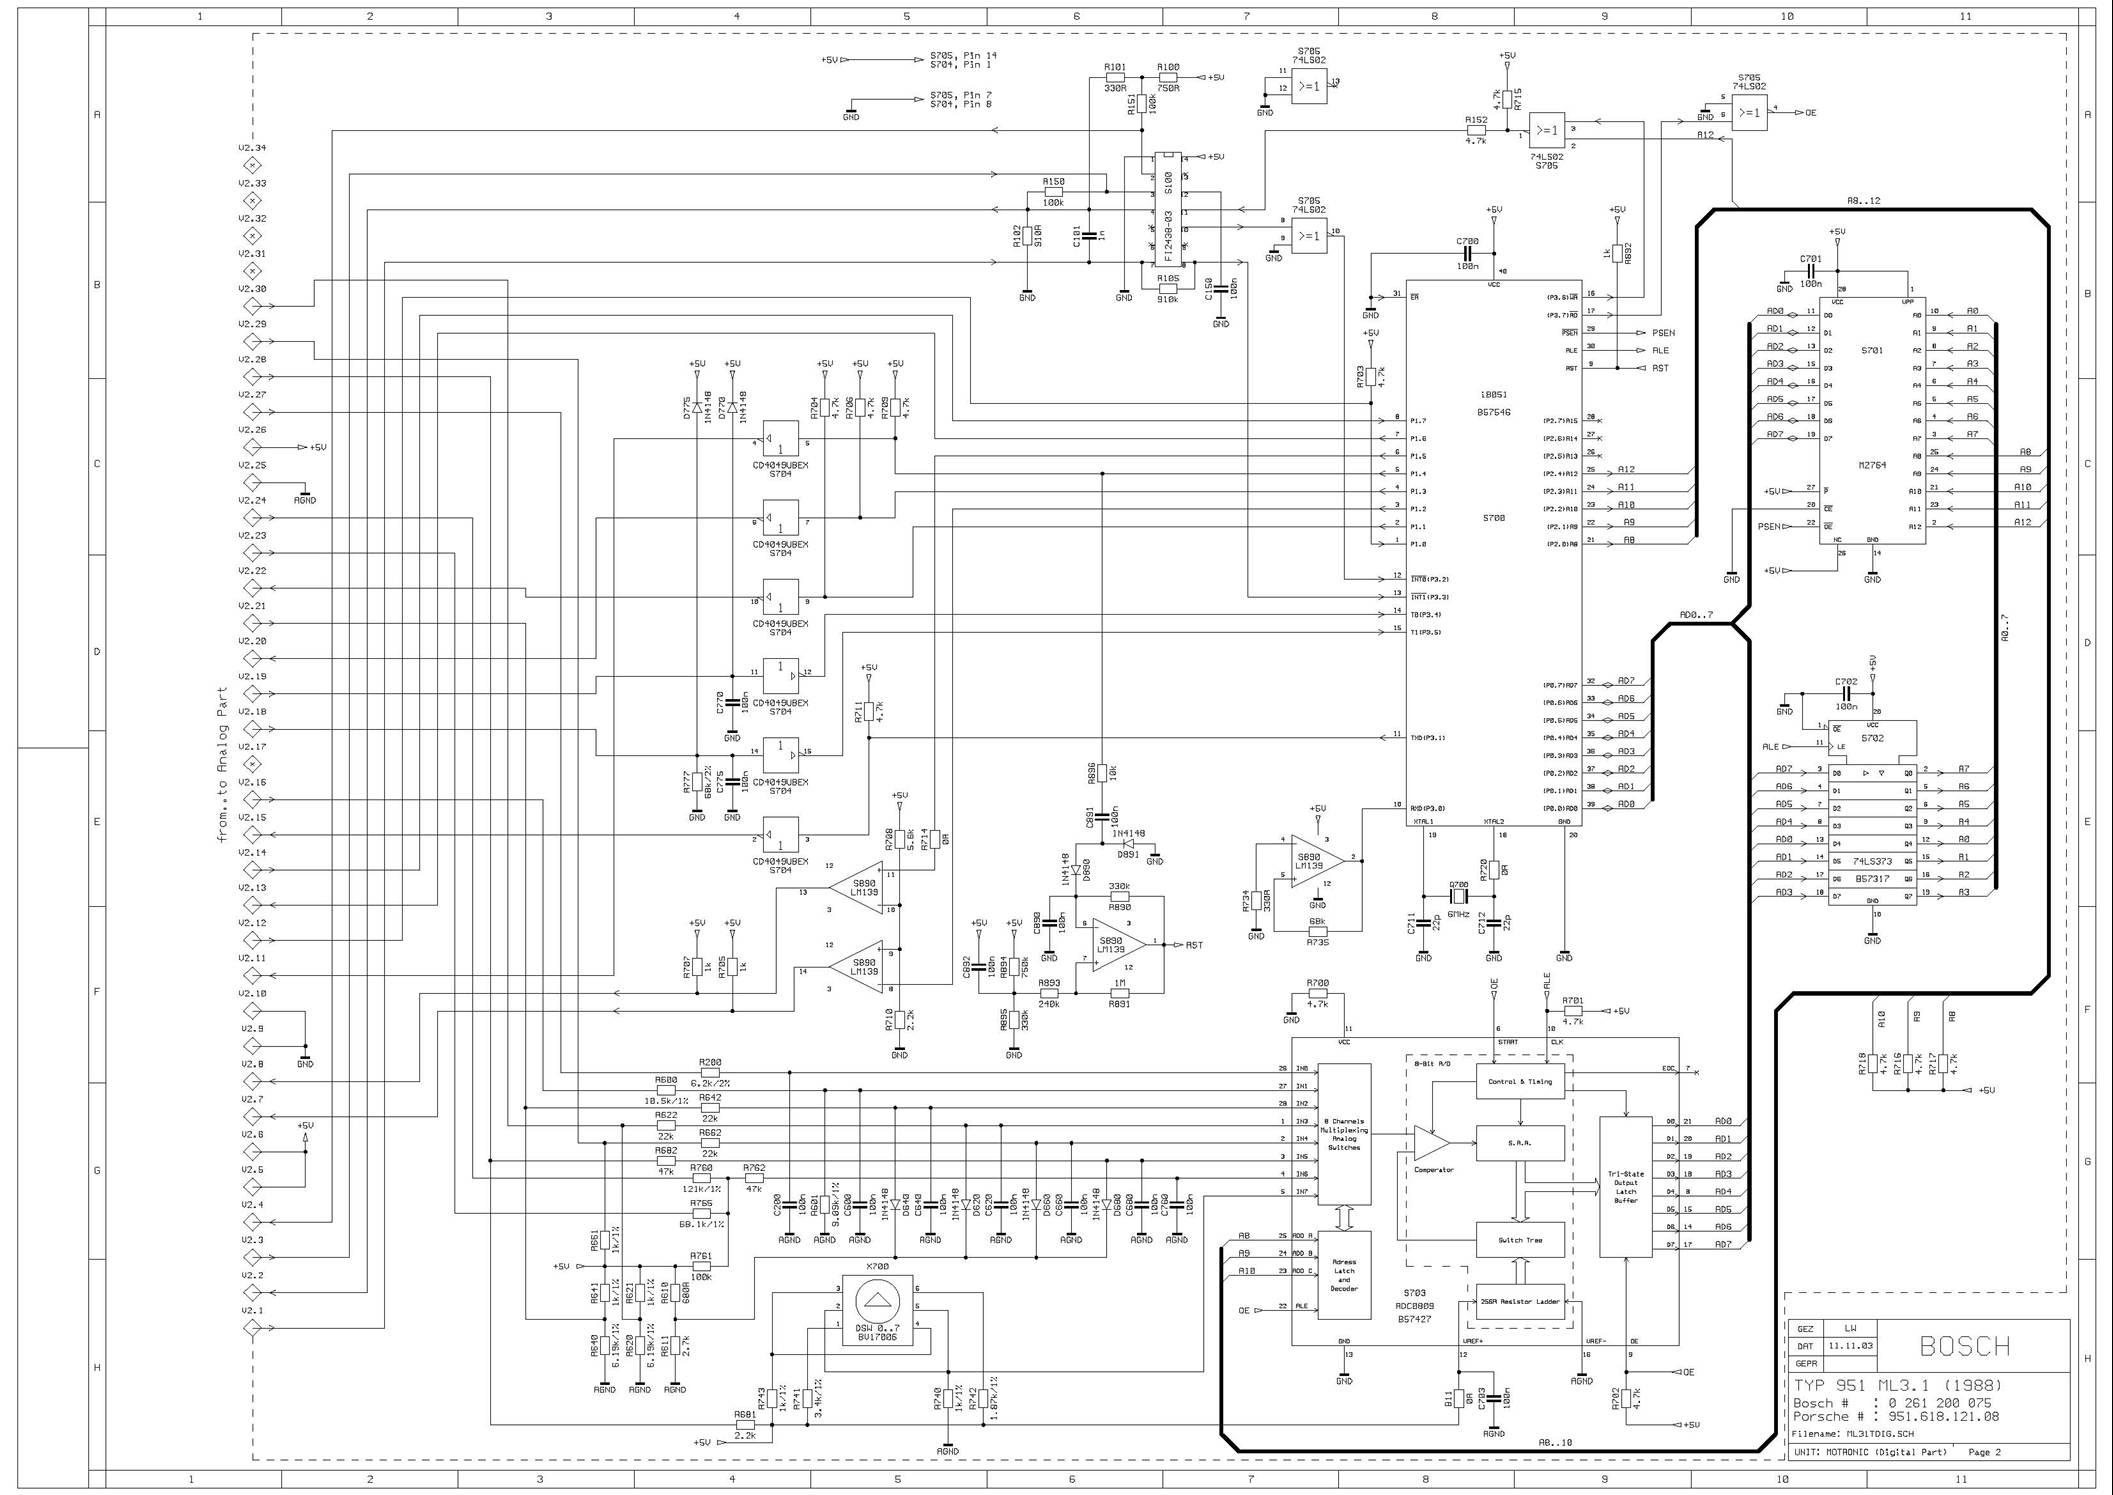 1984 porsche 944 wiring diagrams jeep grand cherokee diagram 1999 1986 fuse box library